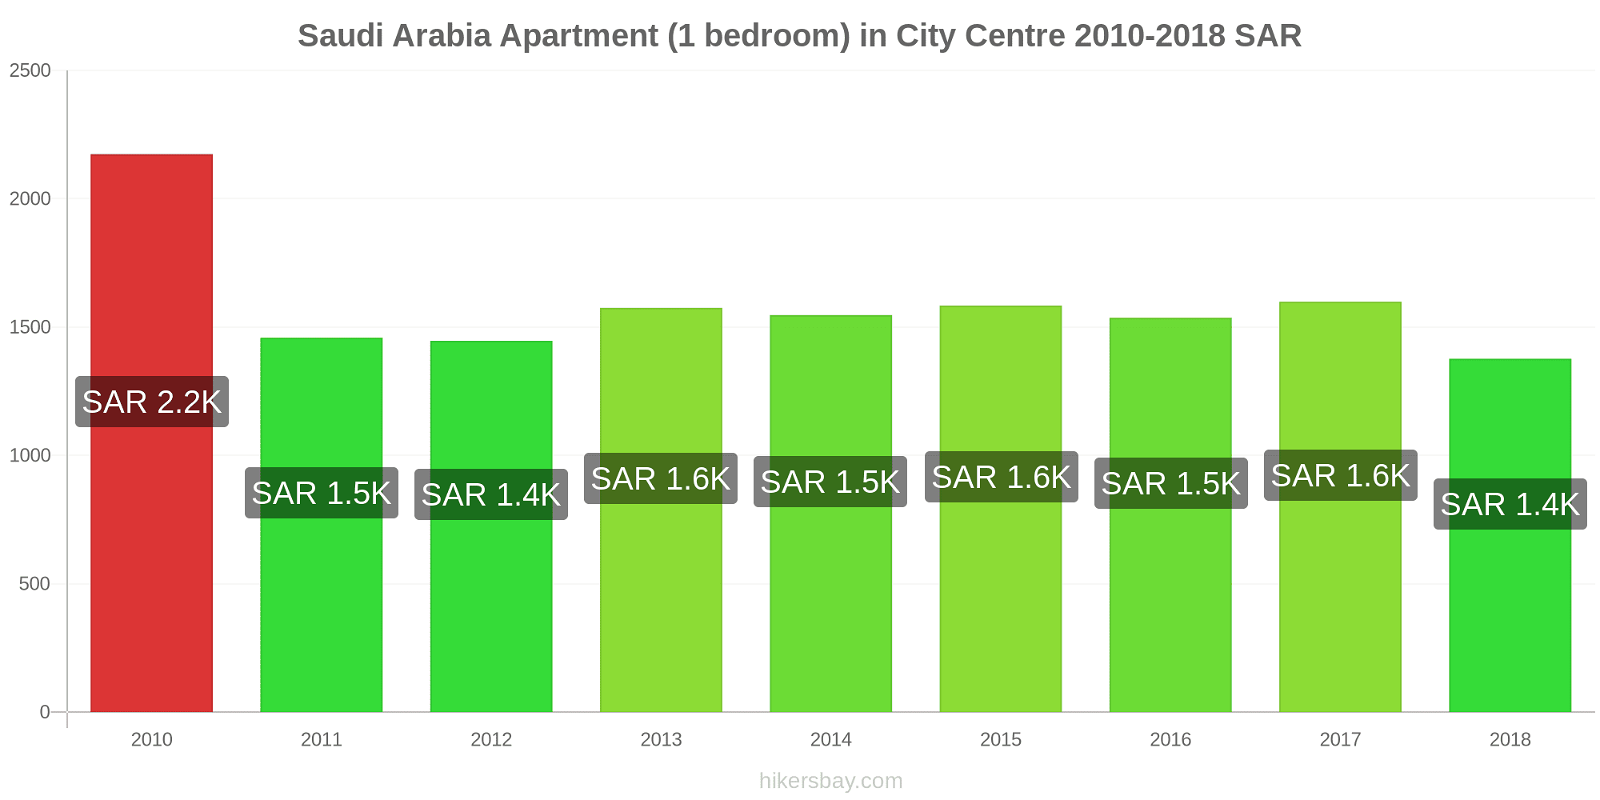 Saudi Arabia price changes Apartment (1 bedroom) in City Centre hikersbay.com